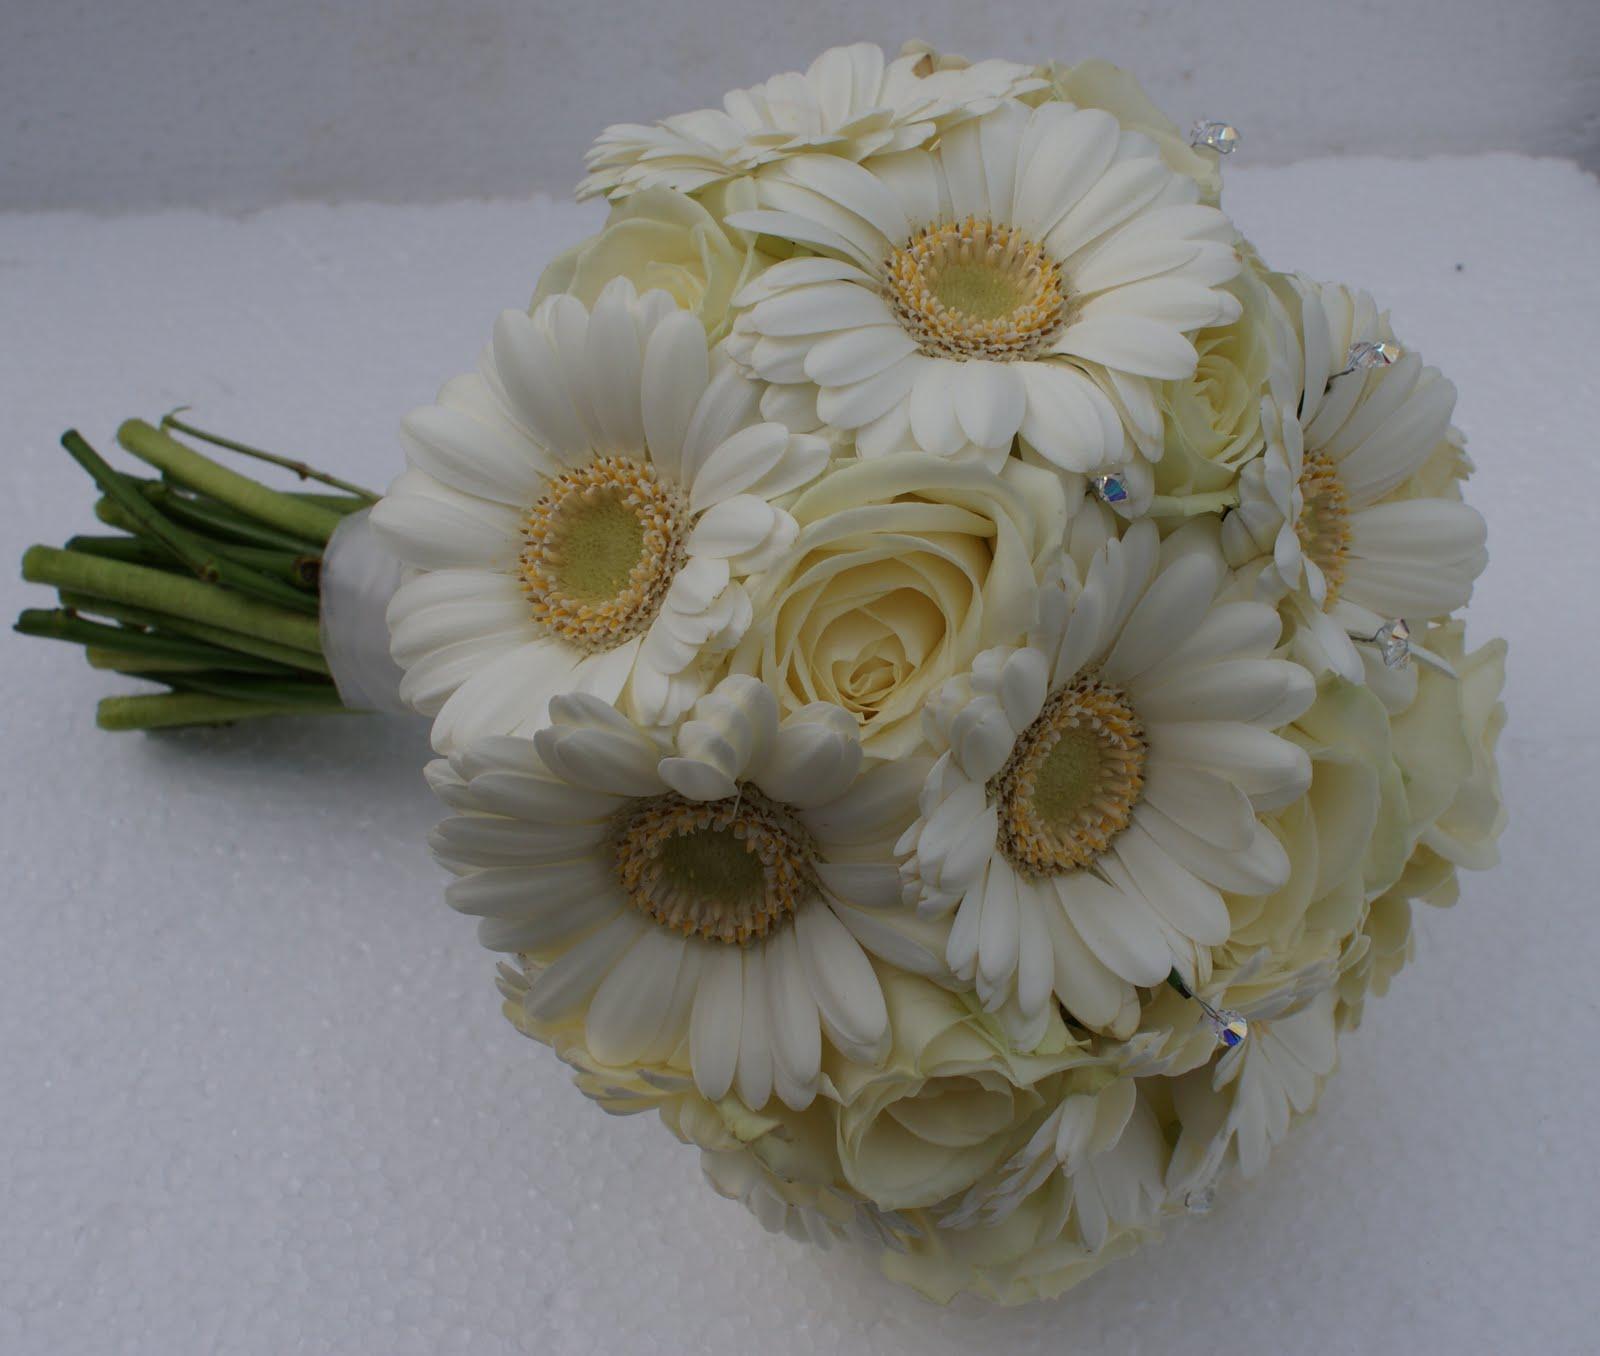 Wedding Flowers Keighley: The Flower Company: Clem Ham